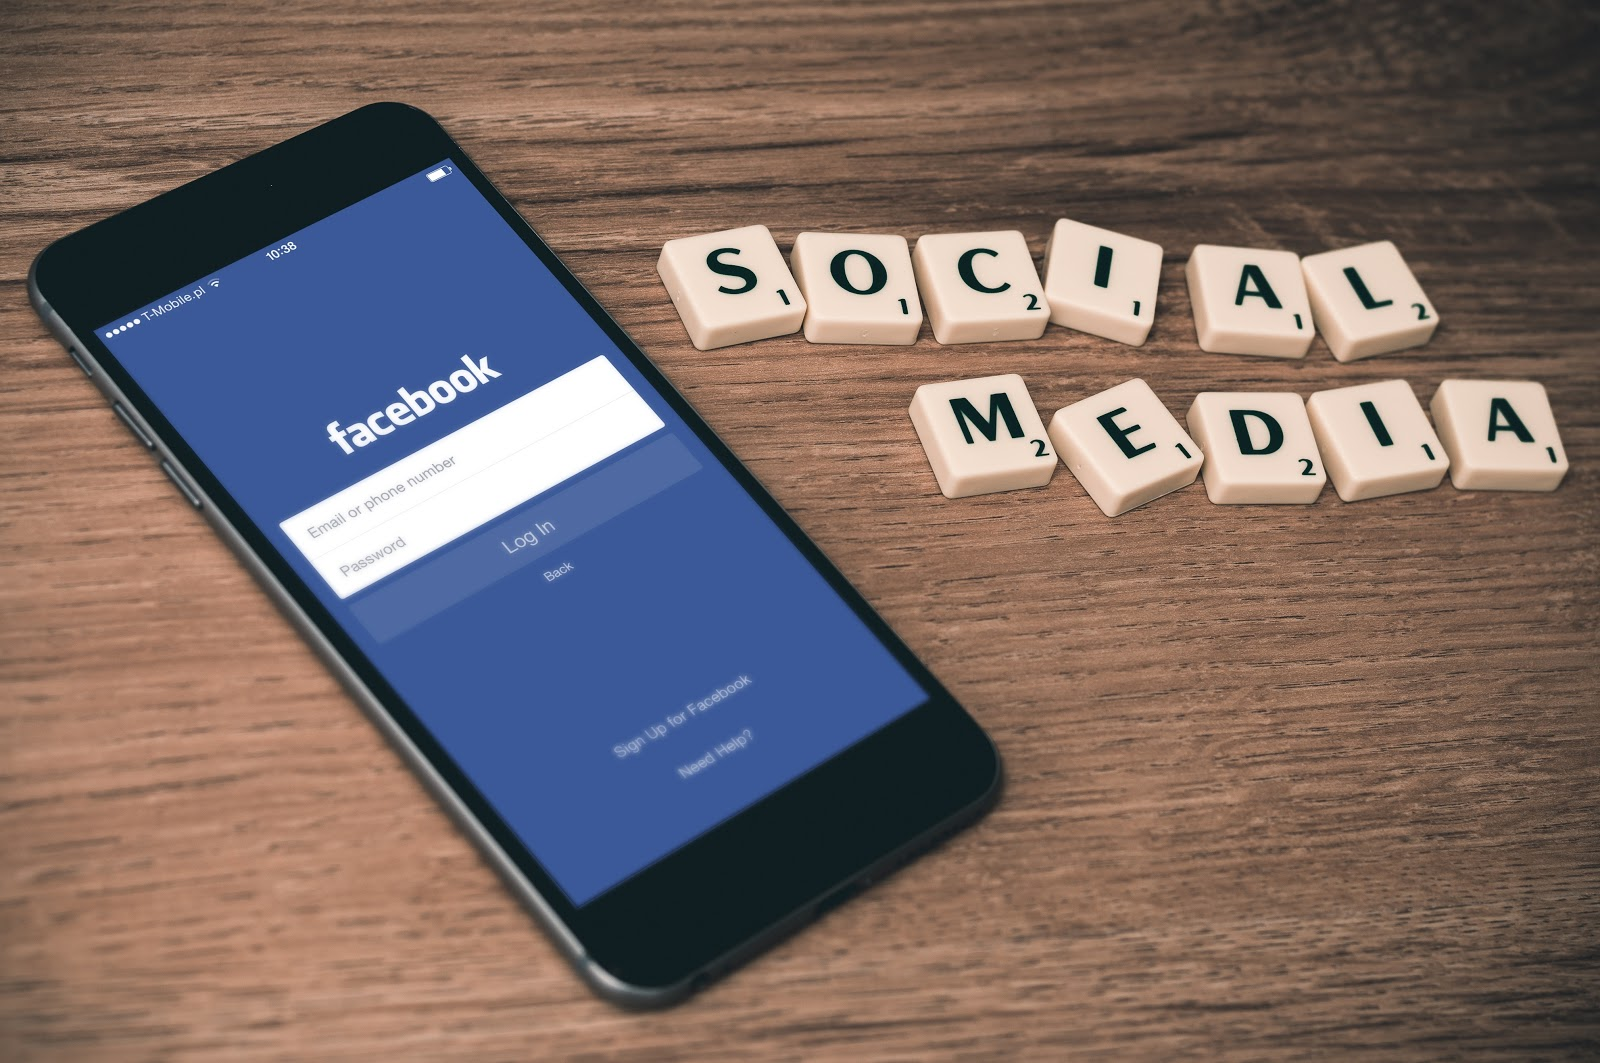 Facebookのログイン画面を映したスマホと「SOCIAL MEDIA」の文字のブロック